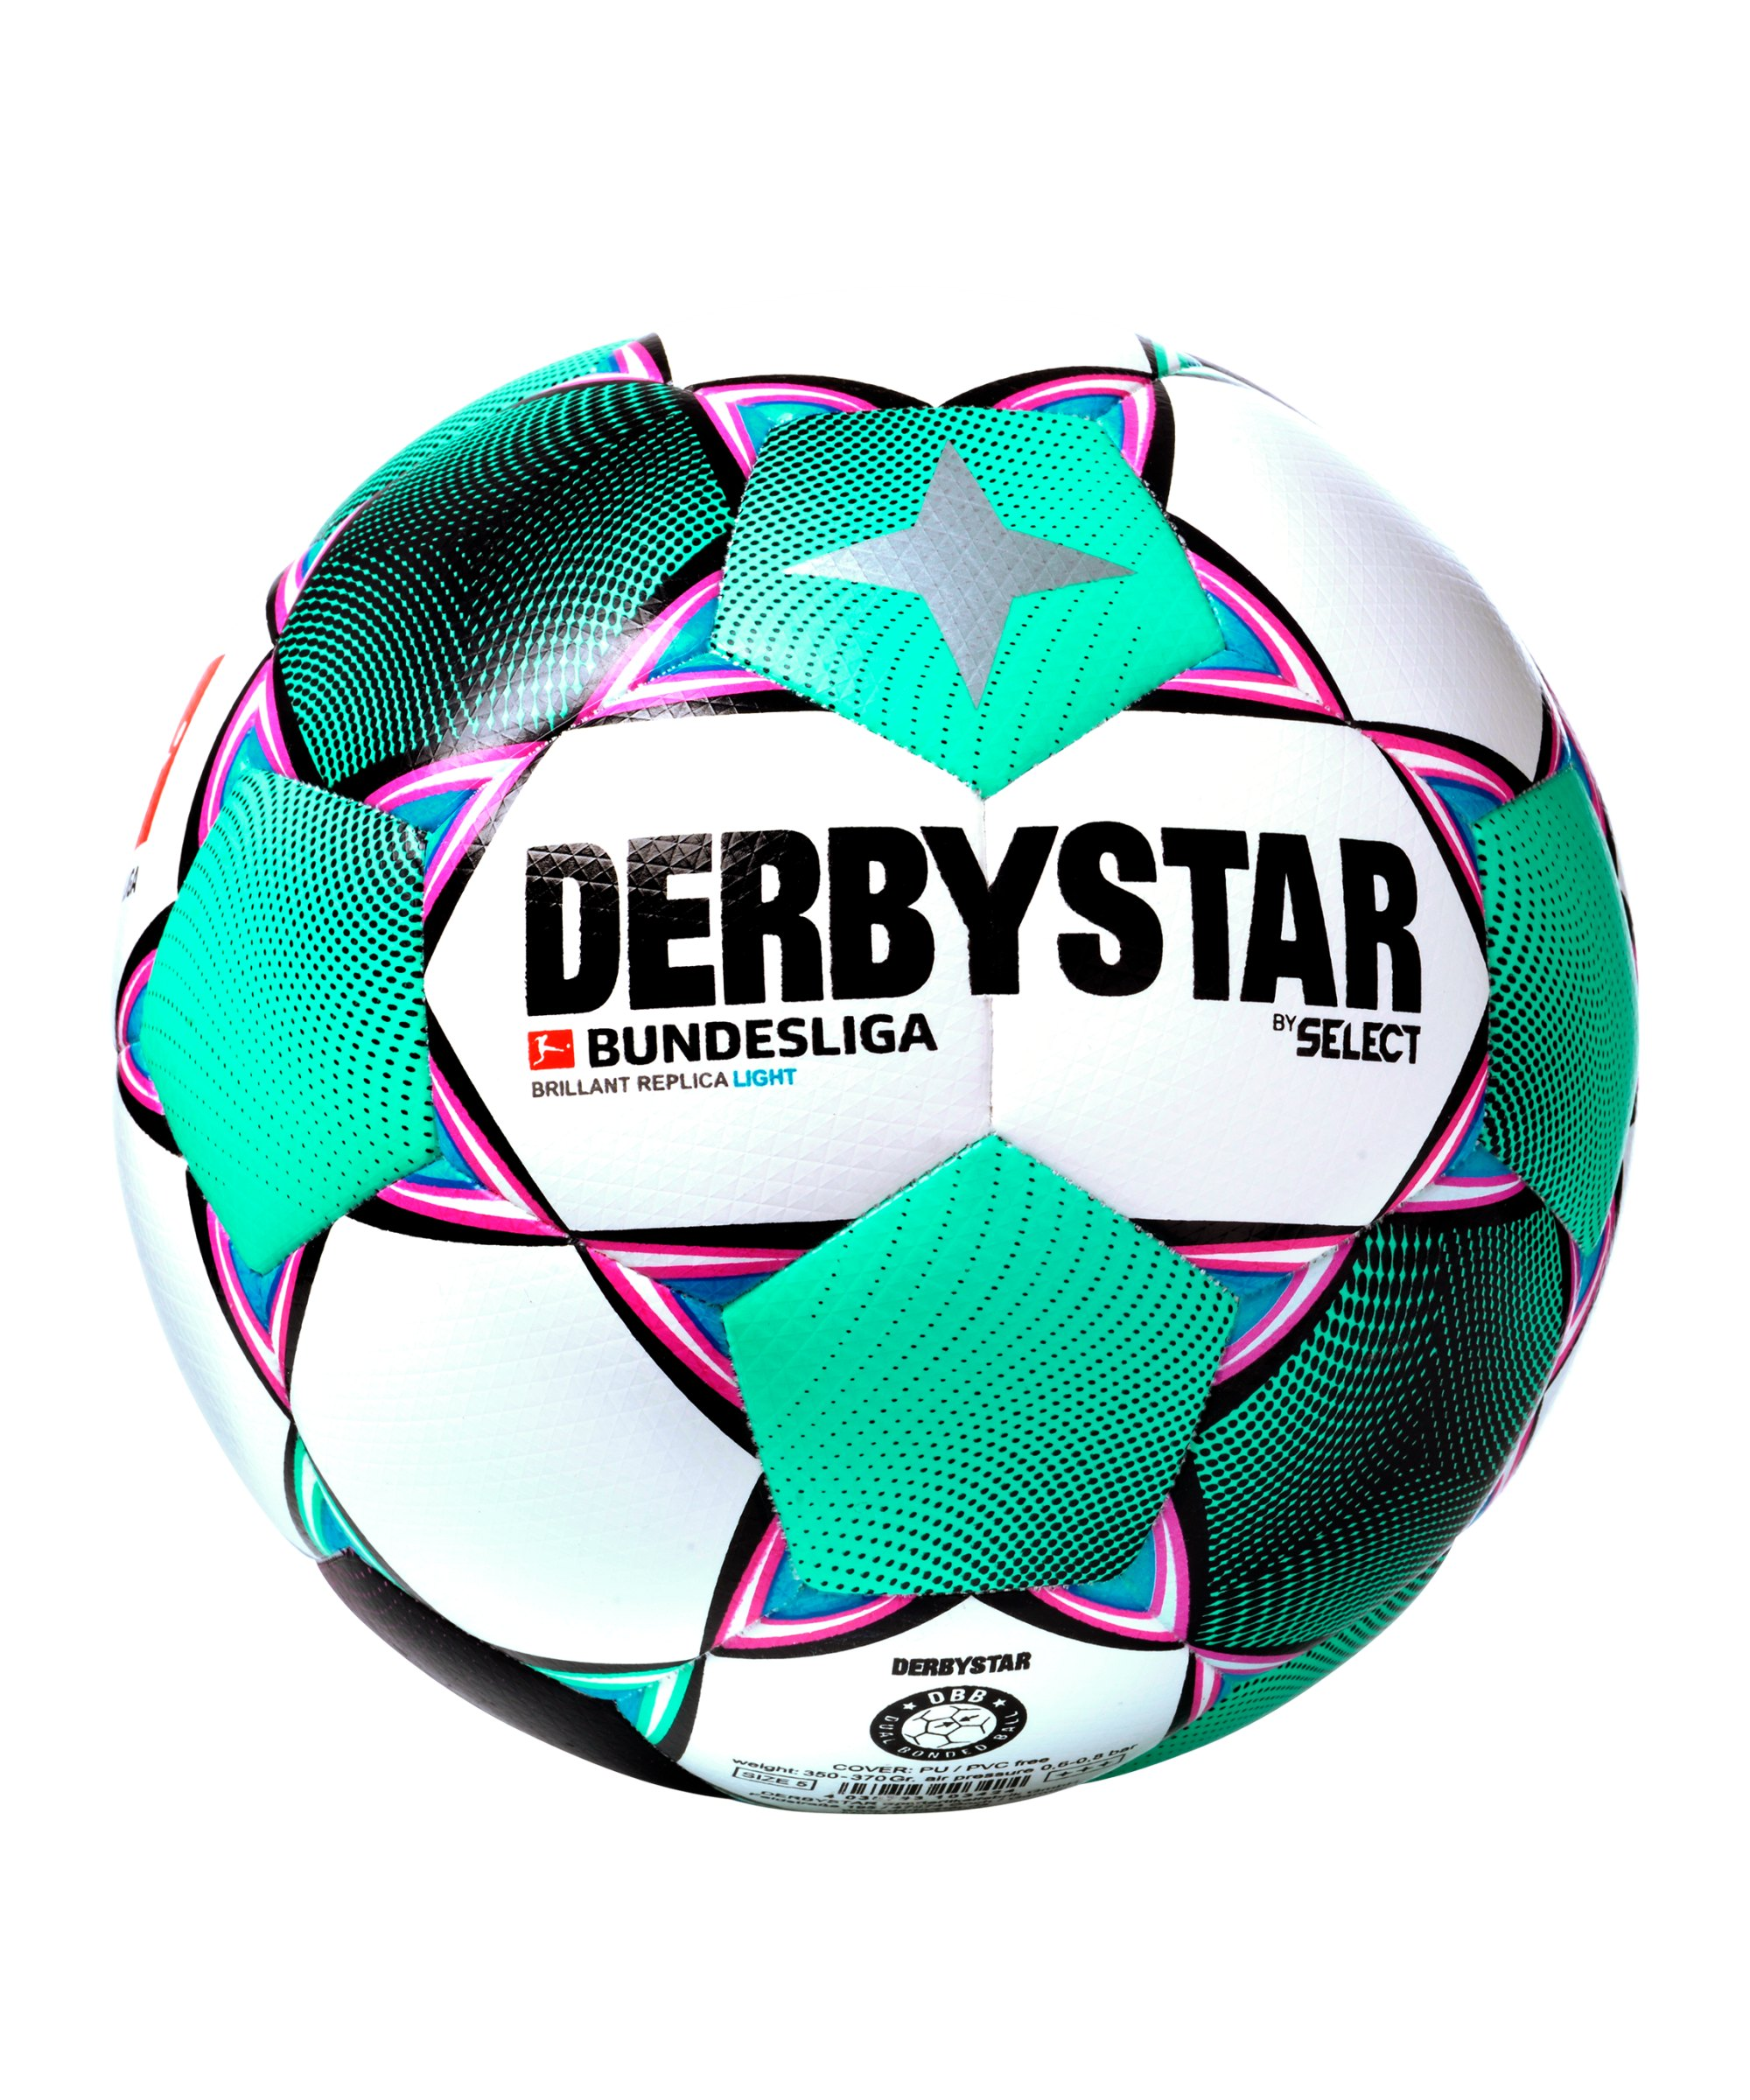 Derbystar BL Brillant Replica Light 350 Gramm Trainingsball Weiss F020 - weiss